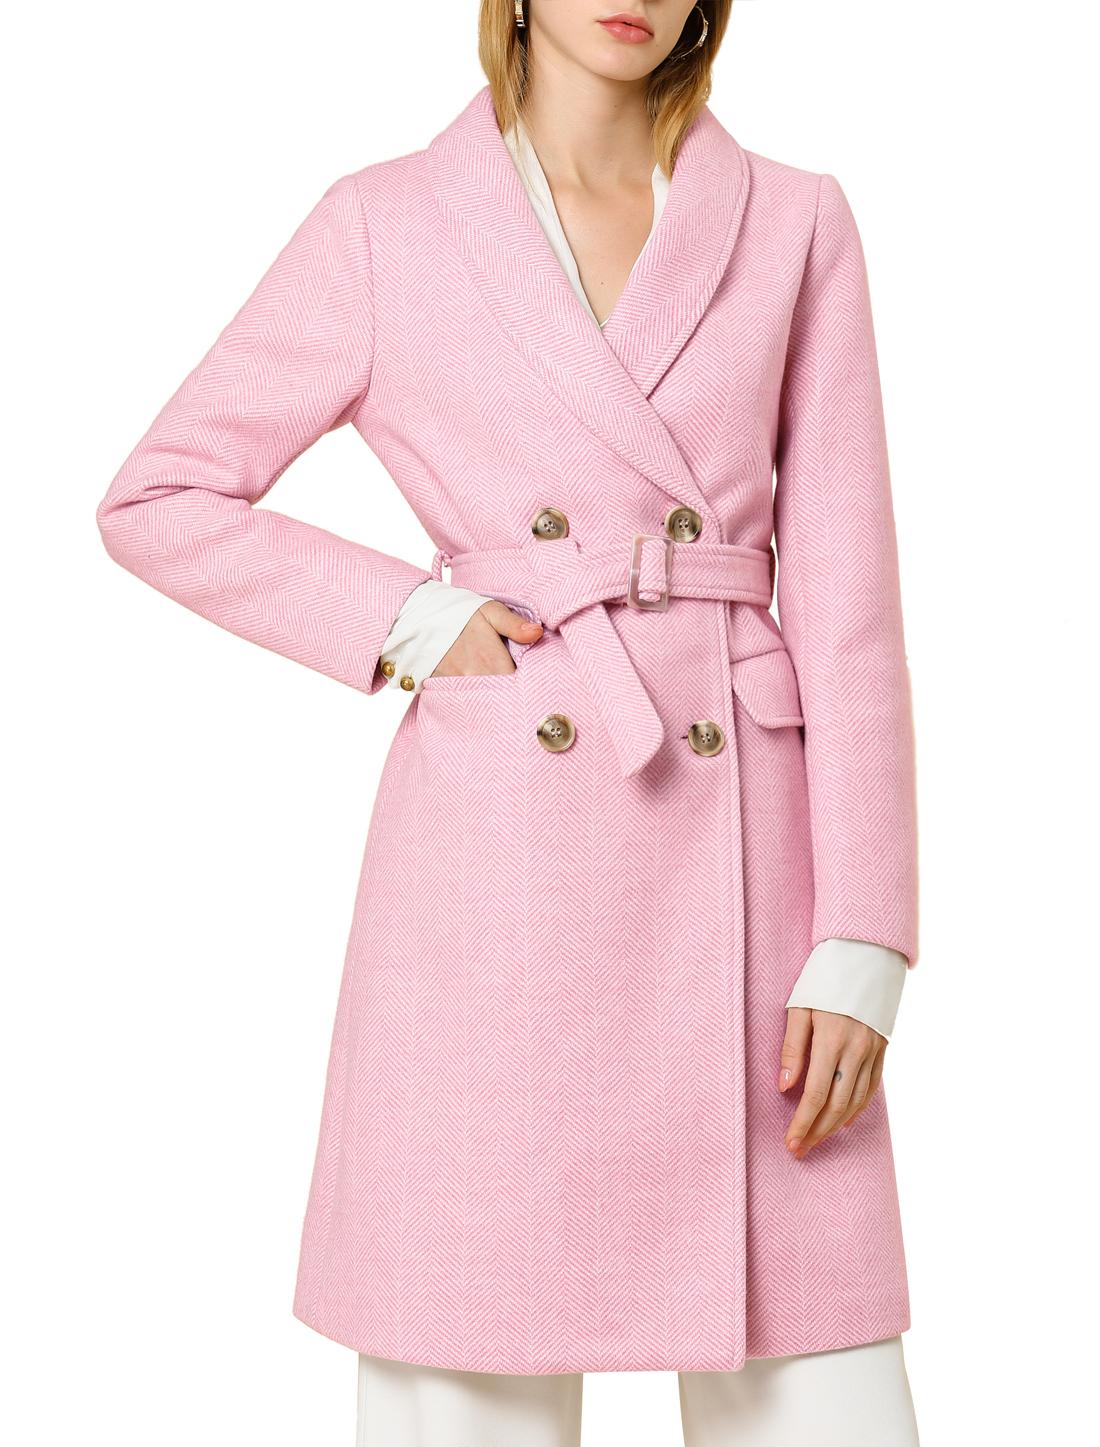 Allegra K Women's Double Breasted Belted Lapel Long Wool Coat Pink XL (US 18)